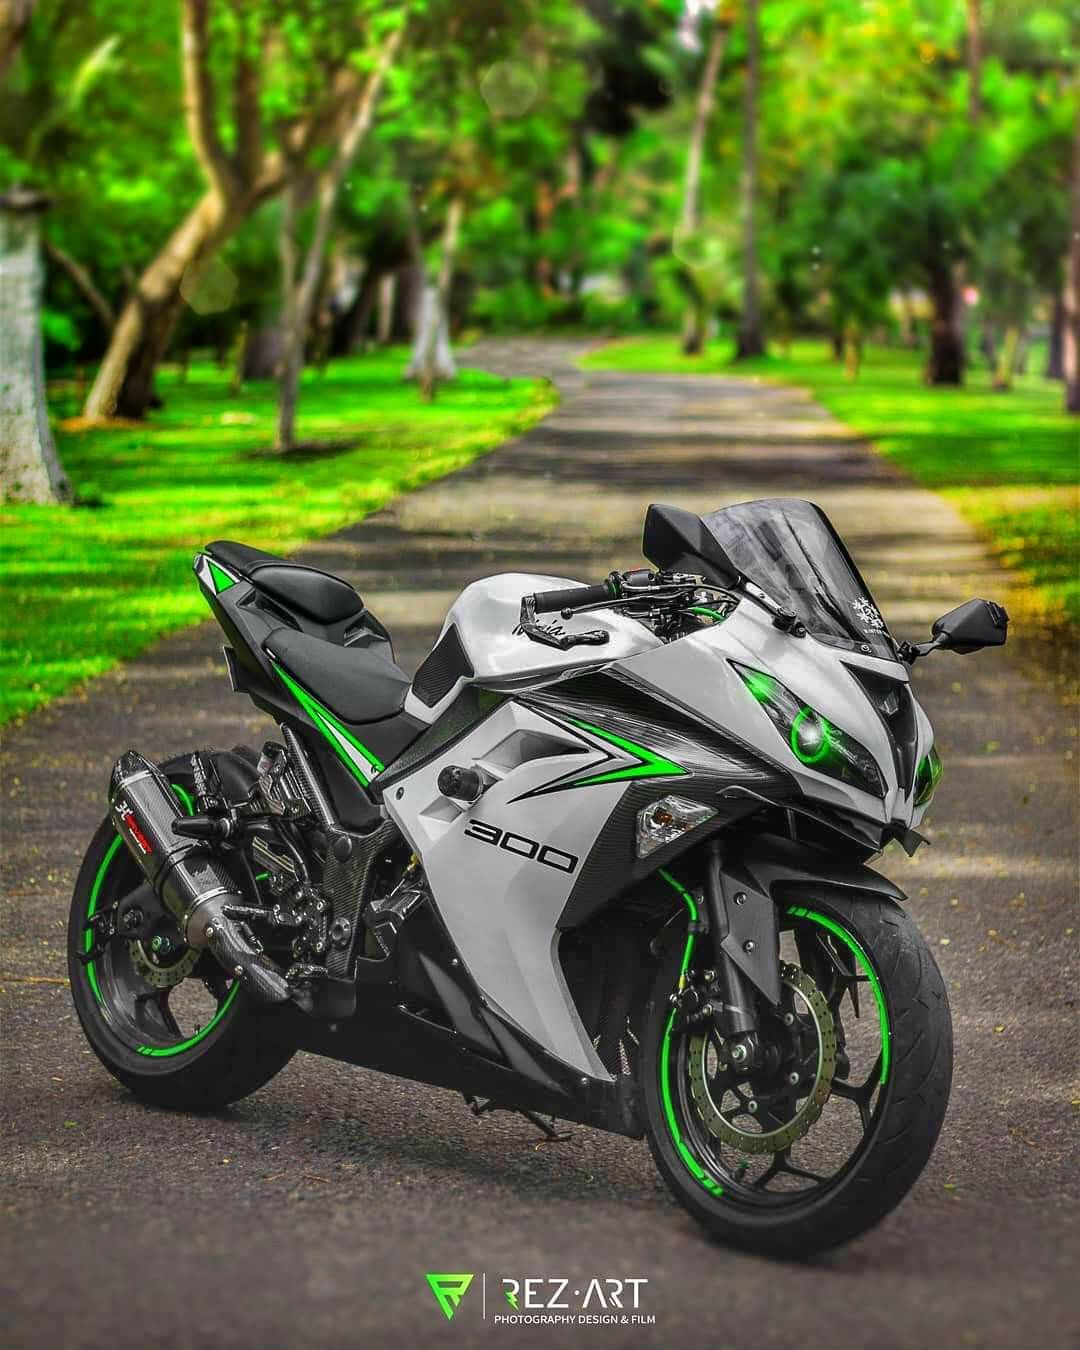 Kwsk Ninja 300 Motos Esportivas Motos Kasinski